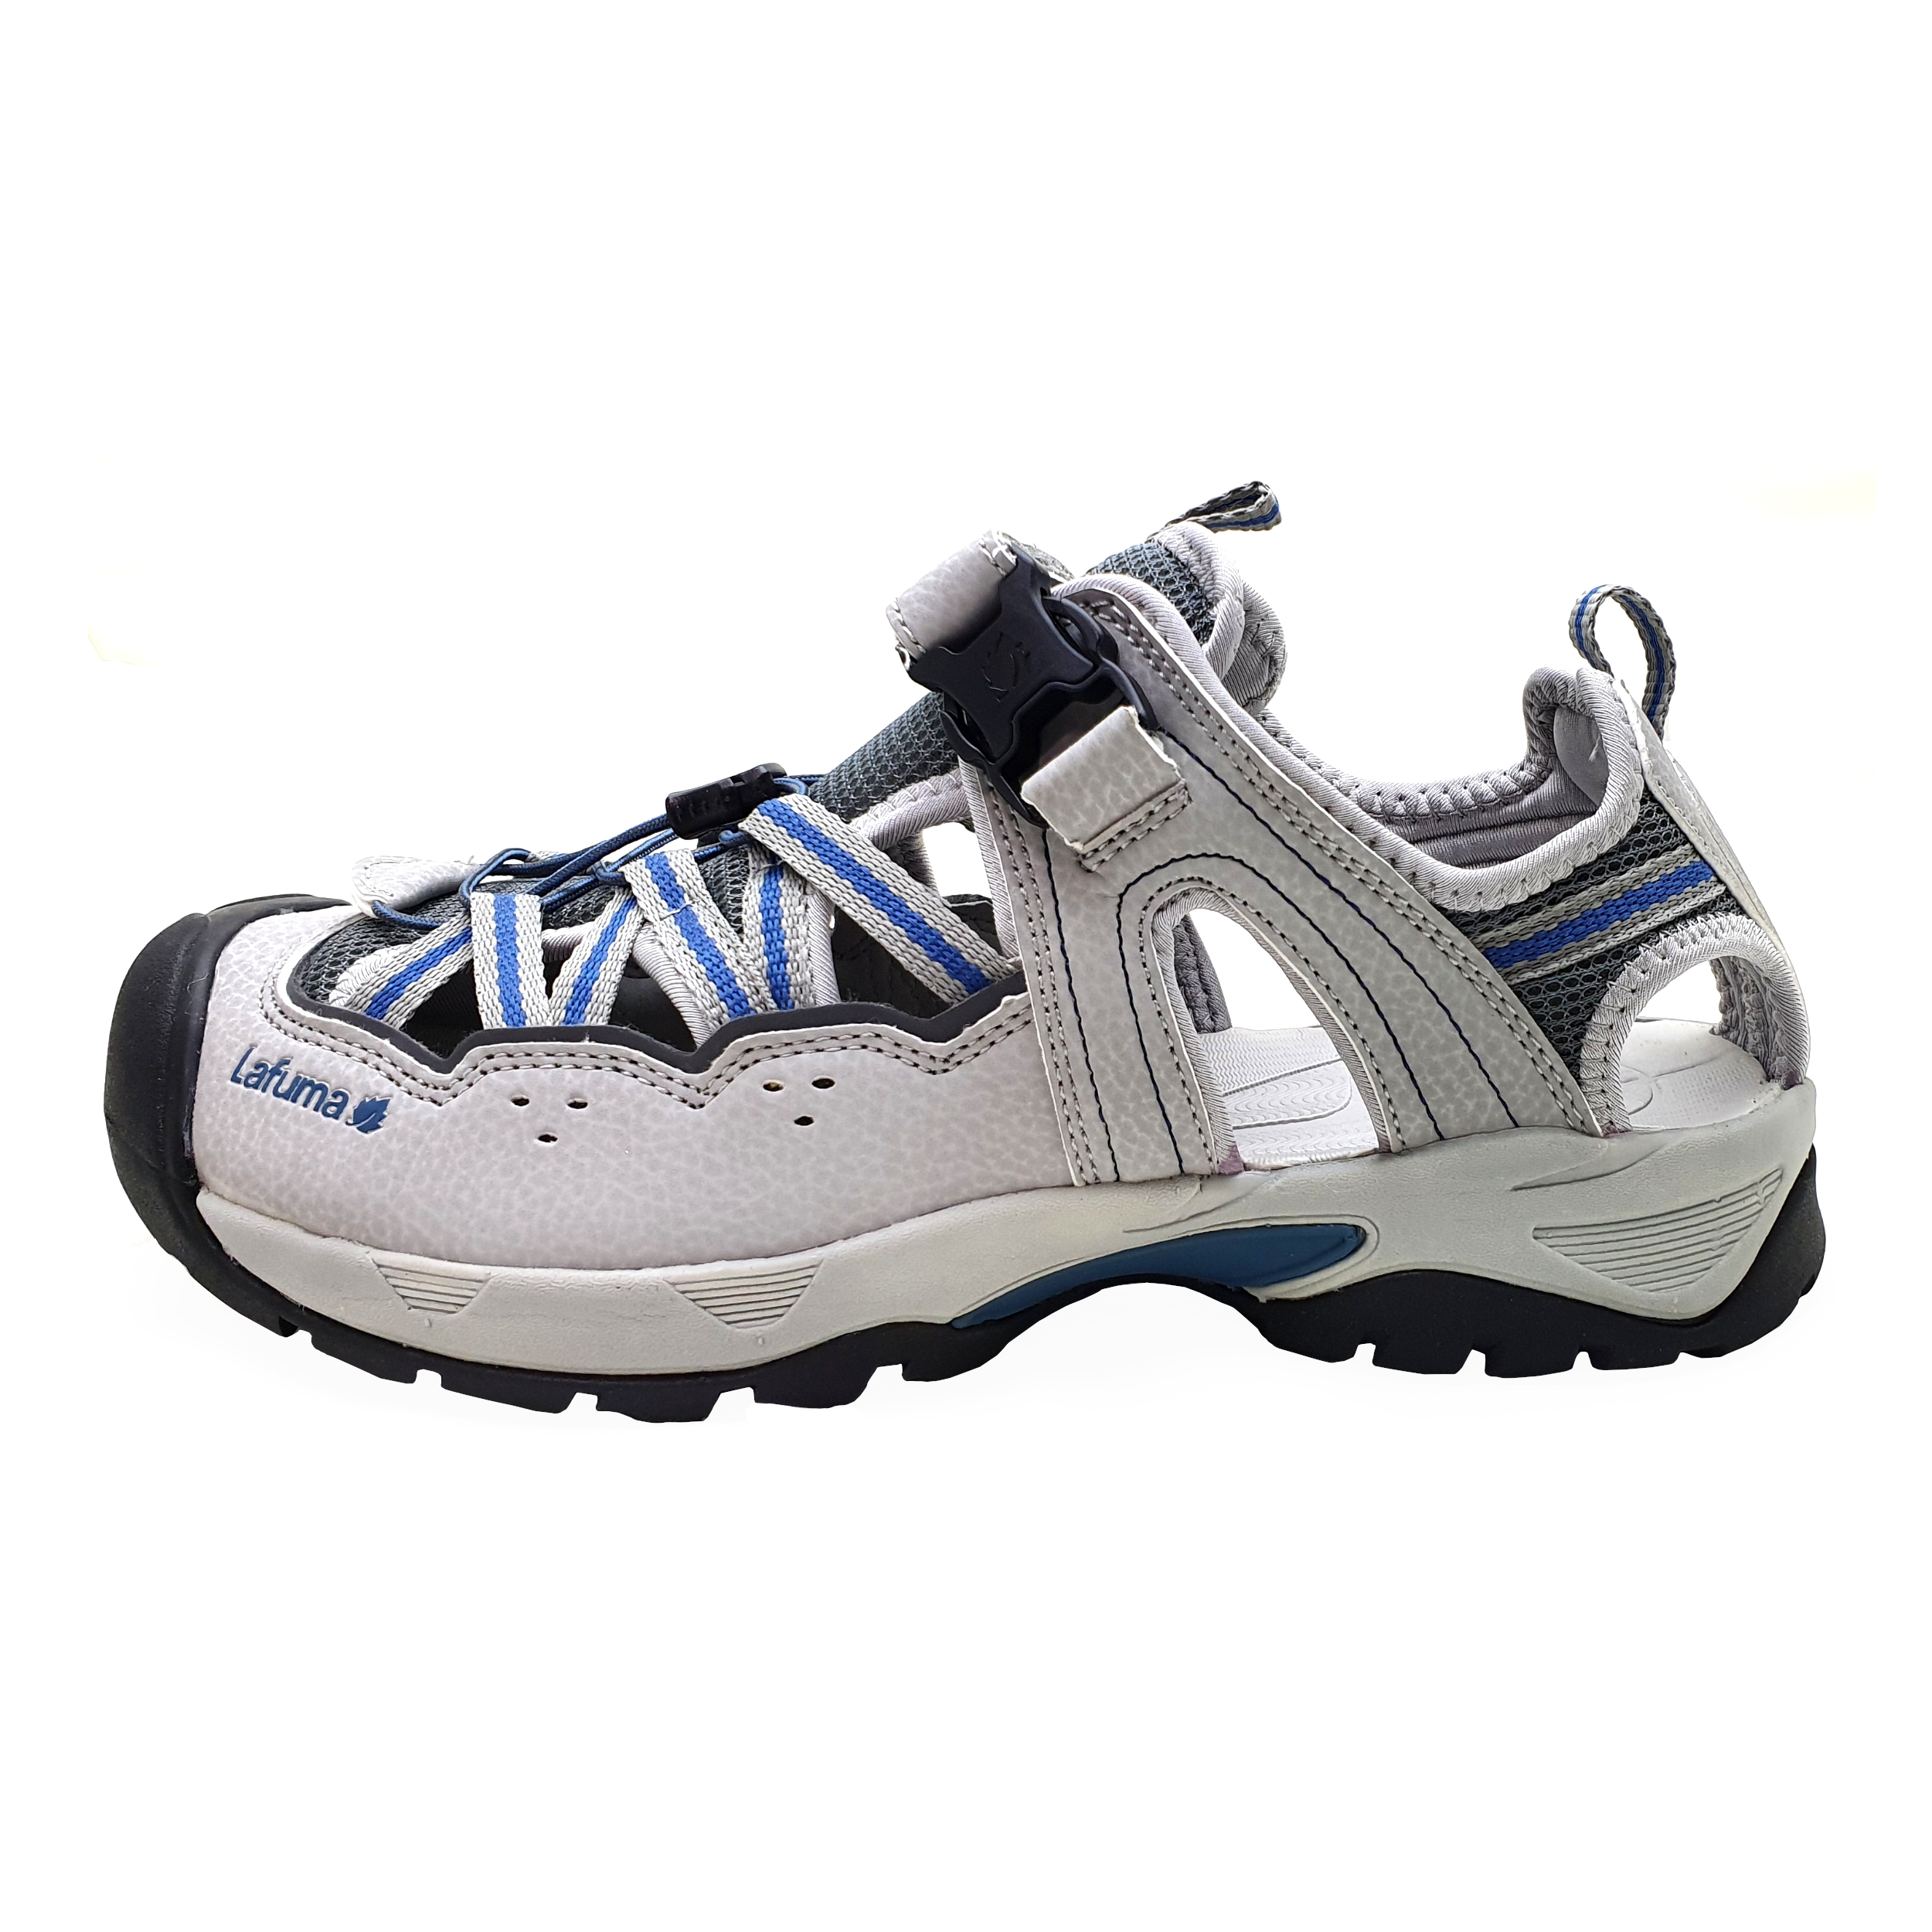 کفش طبیعت گردی زنانه لافوما مدل LD KALLADY - LFG 2191